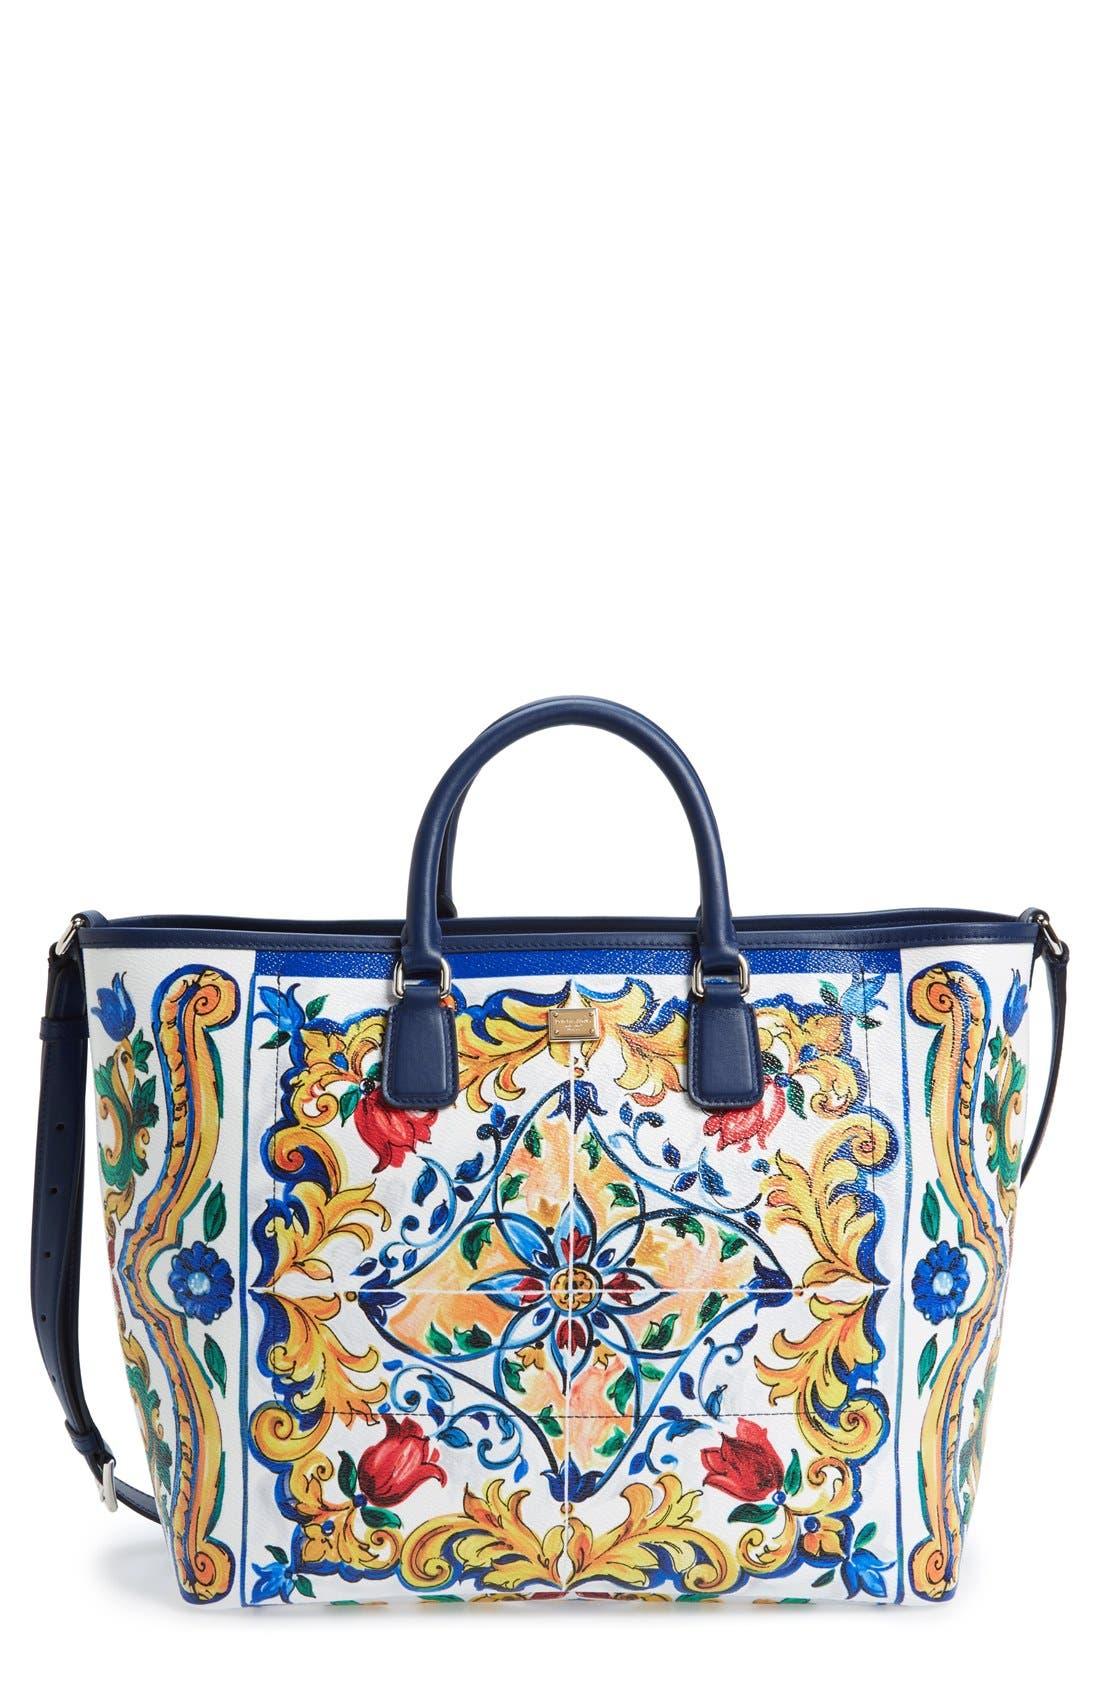 Main Image - Dolce&Gabbana 'Lara' Mallorca Print Painted Shopper